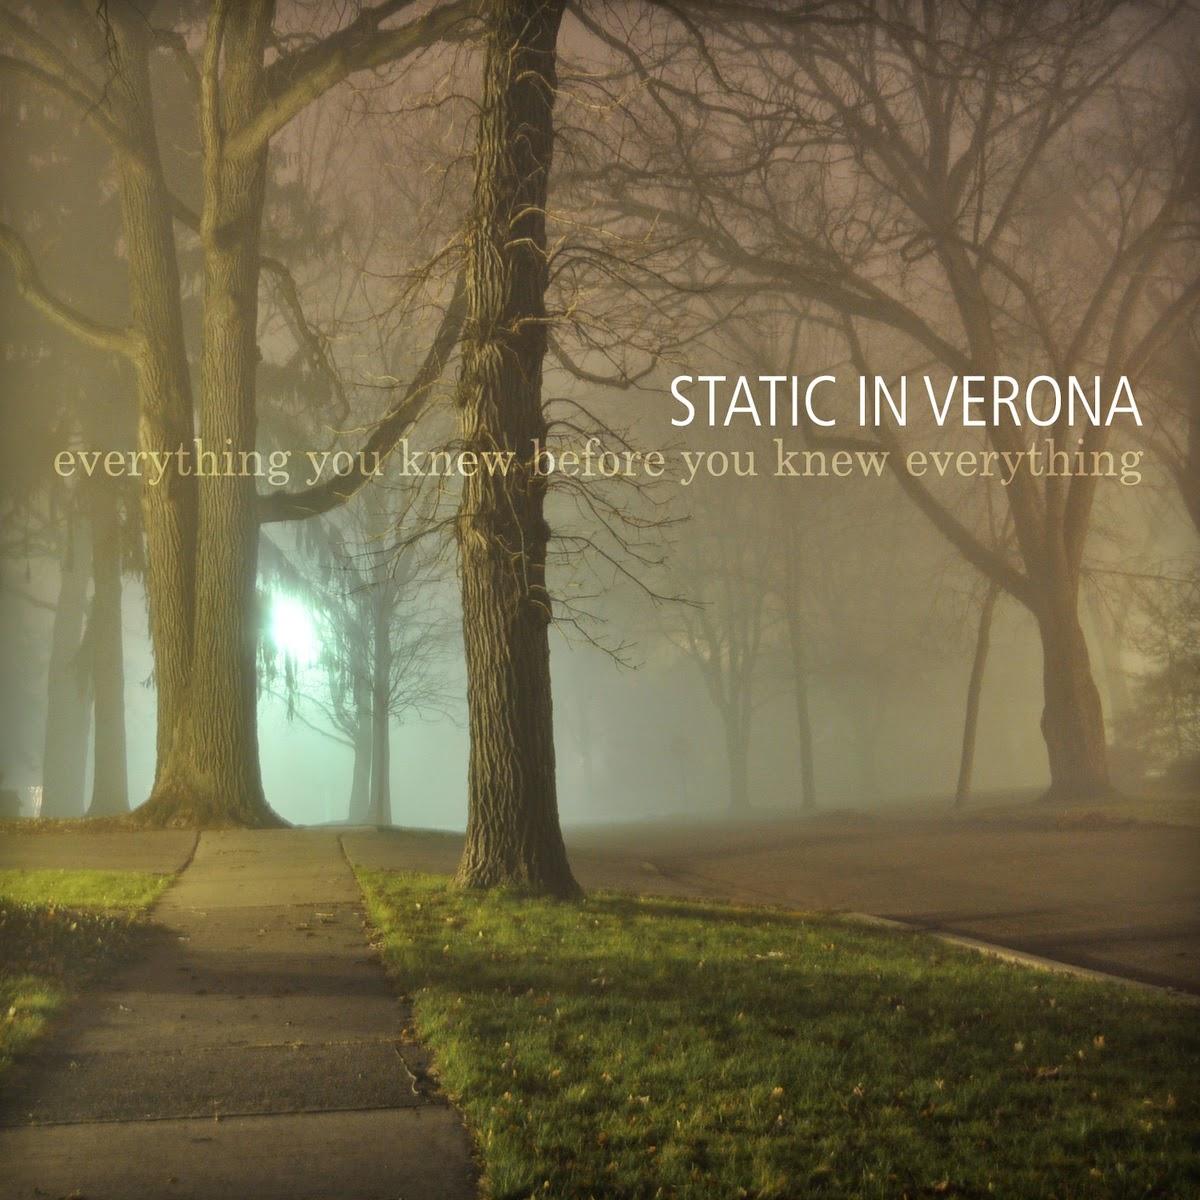 static verona - photo#3